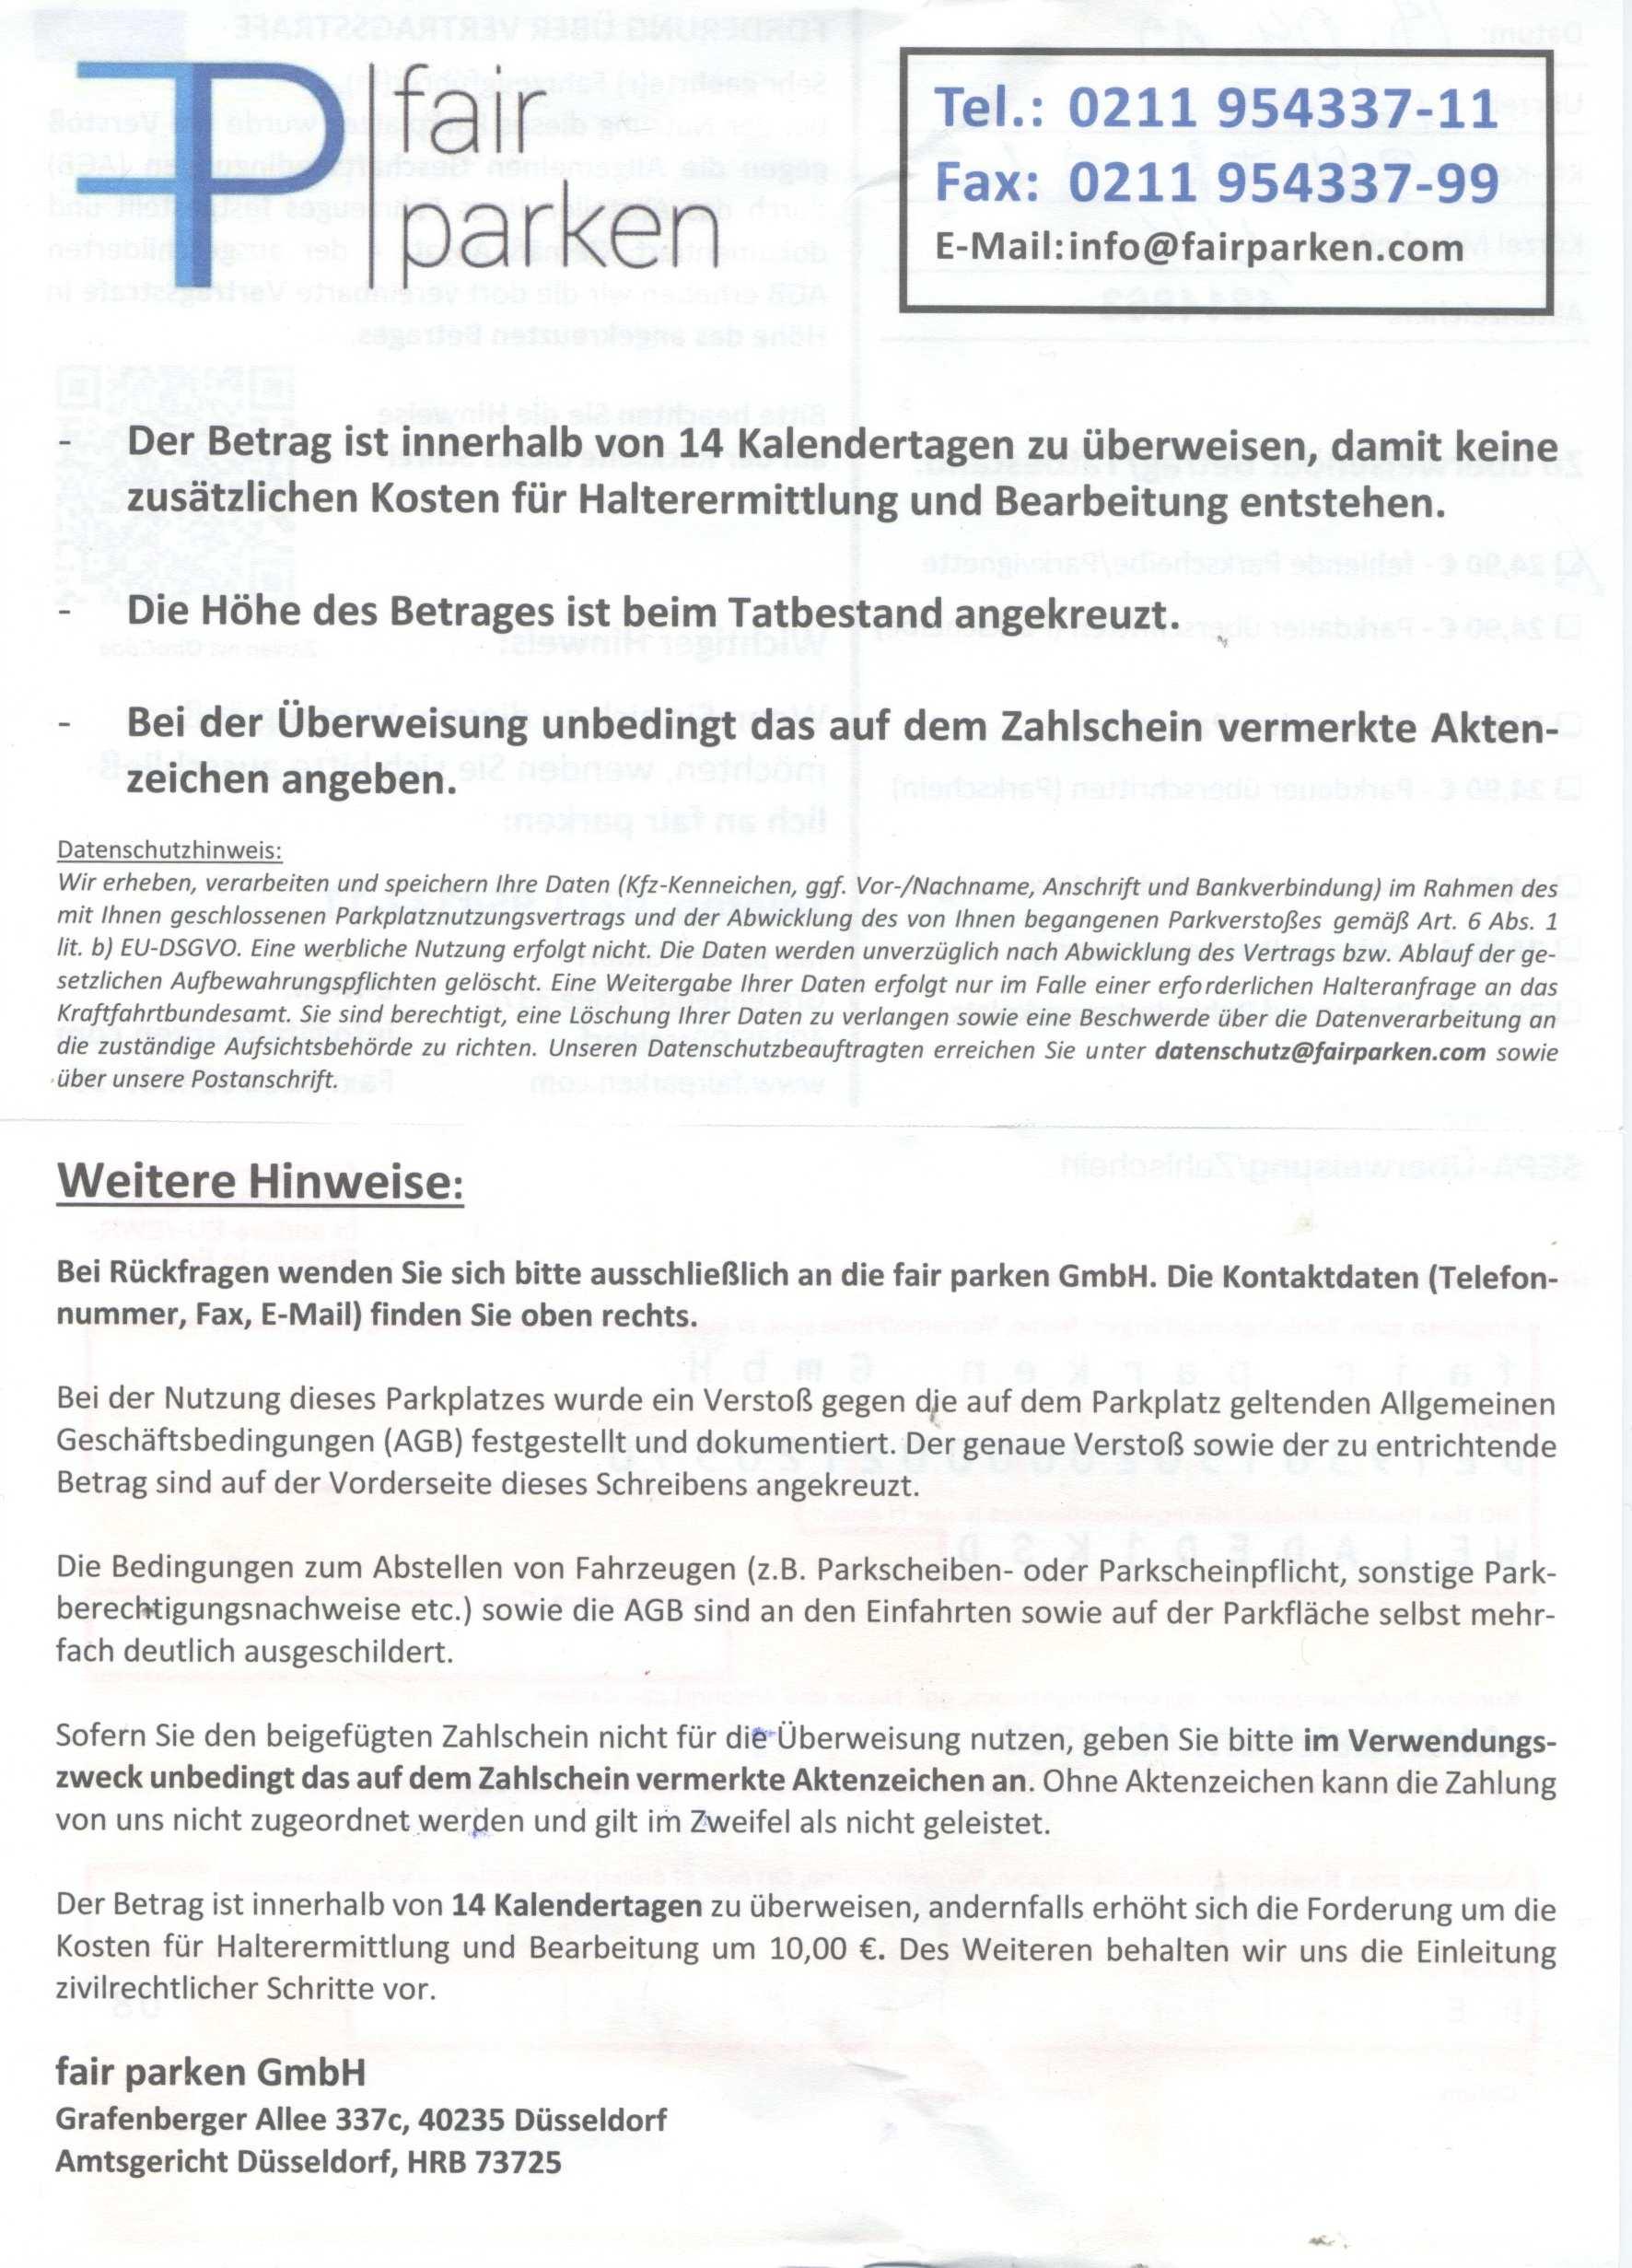 Bonndirekt Com Parken Bei Edeka Fair Parken Oder Unfaire Abzocke